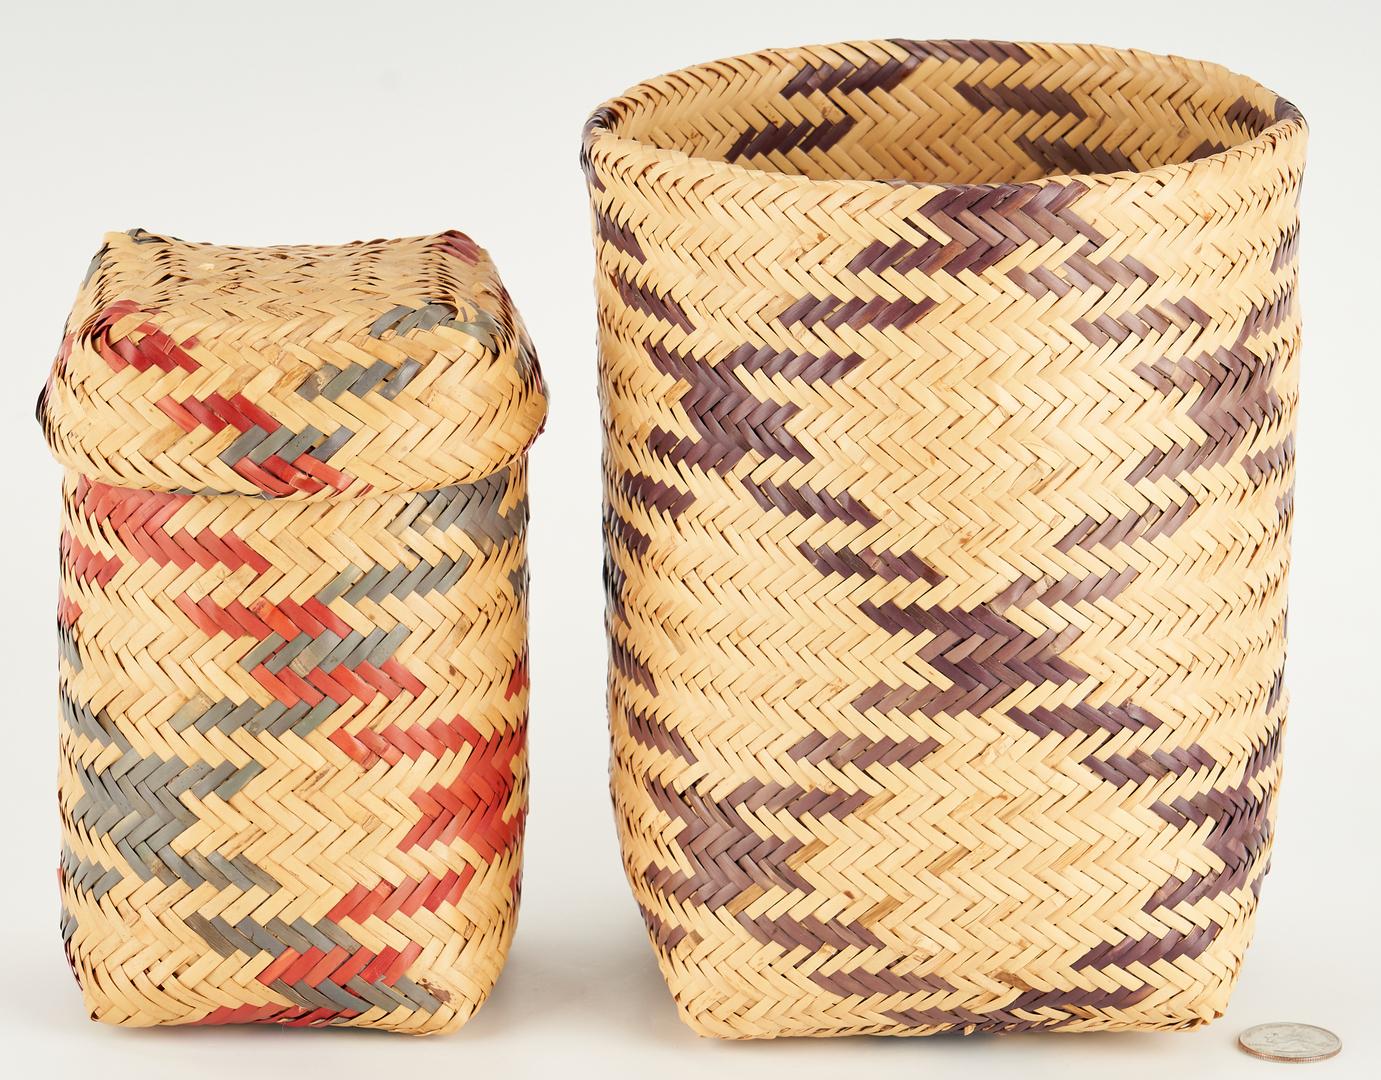 Lot 657: 2 Contemporary Choctaw Rivercane Baskets